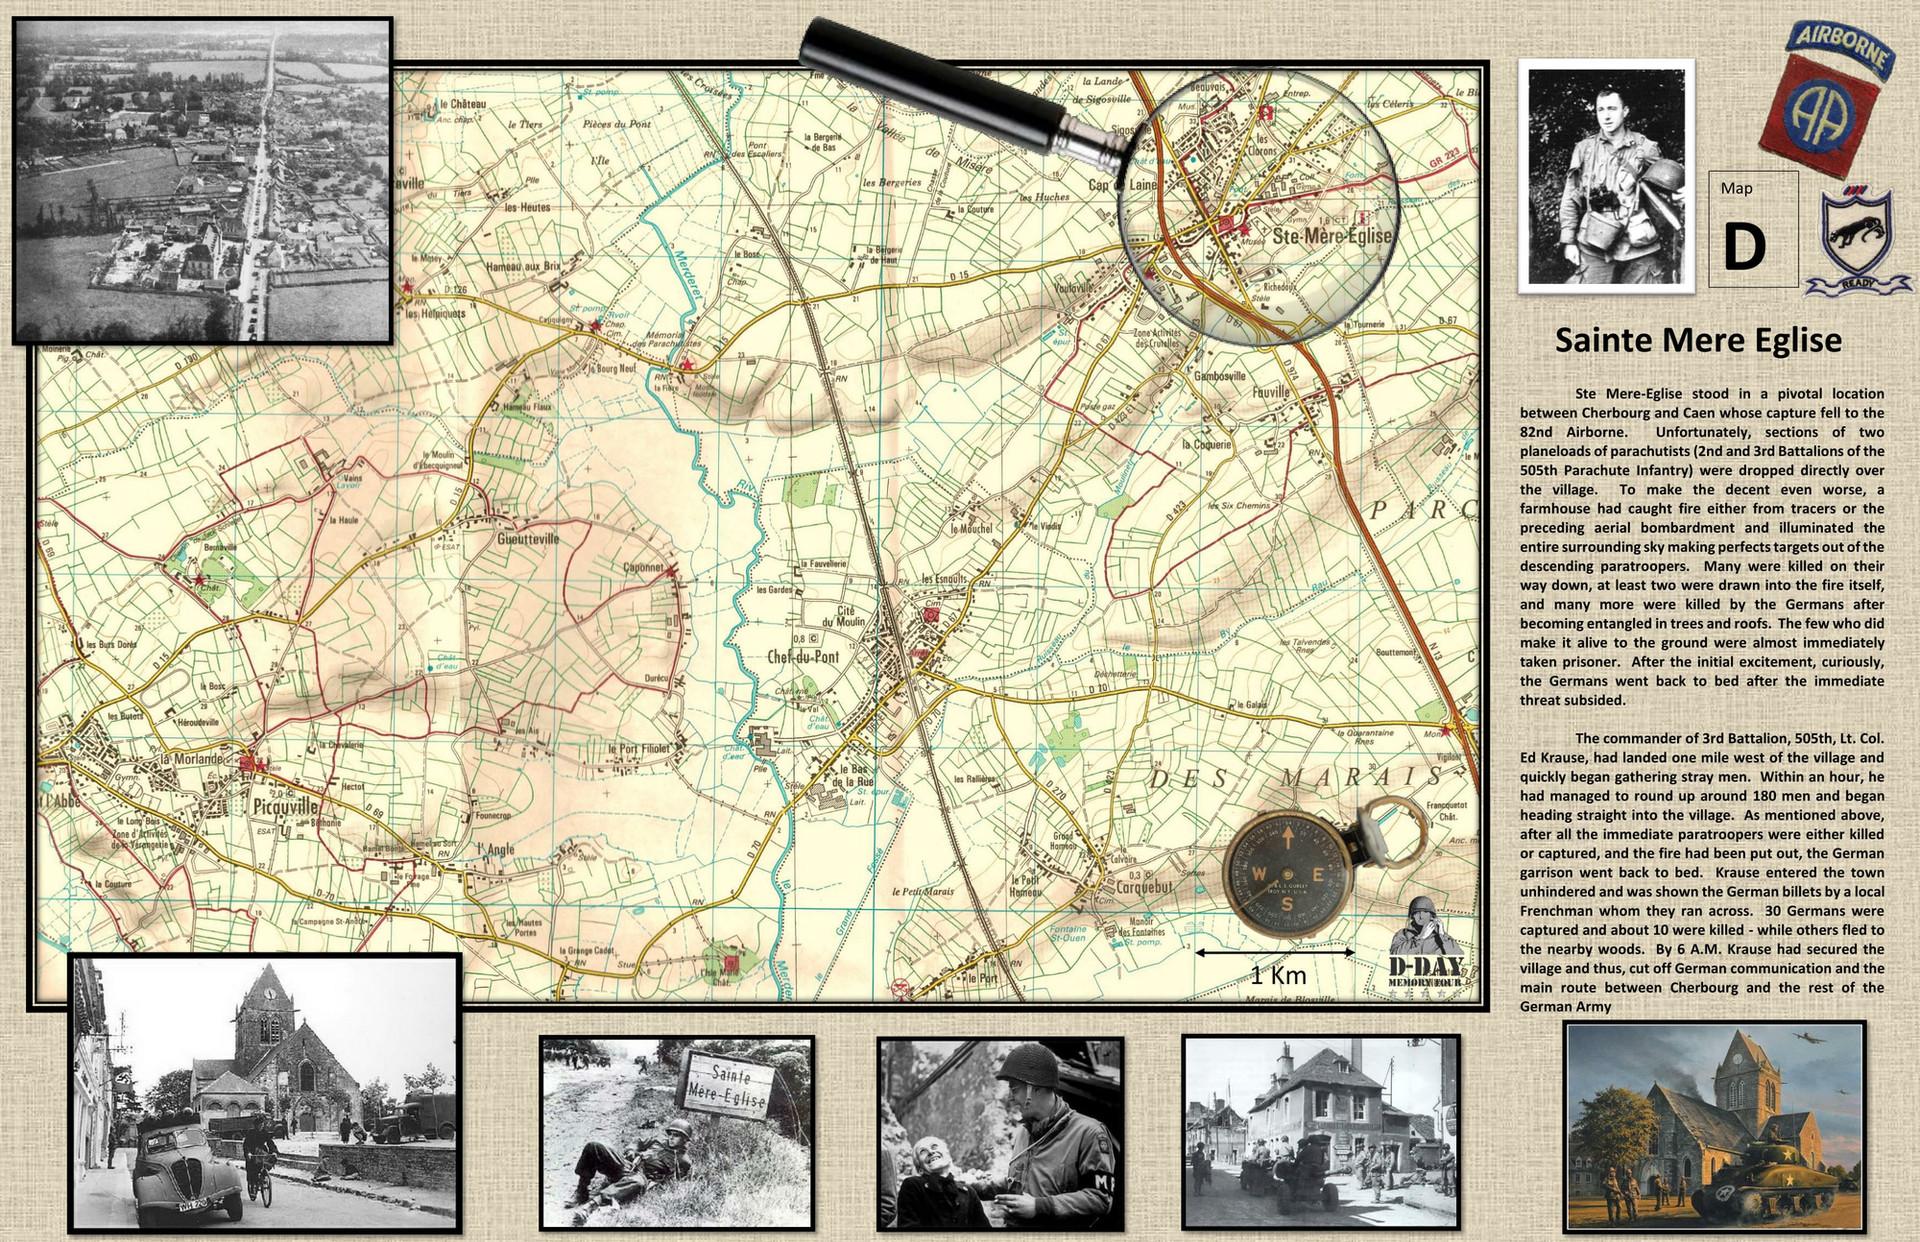 Map D st mwere eglise-1.jpg